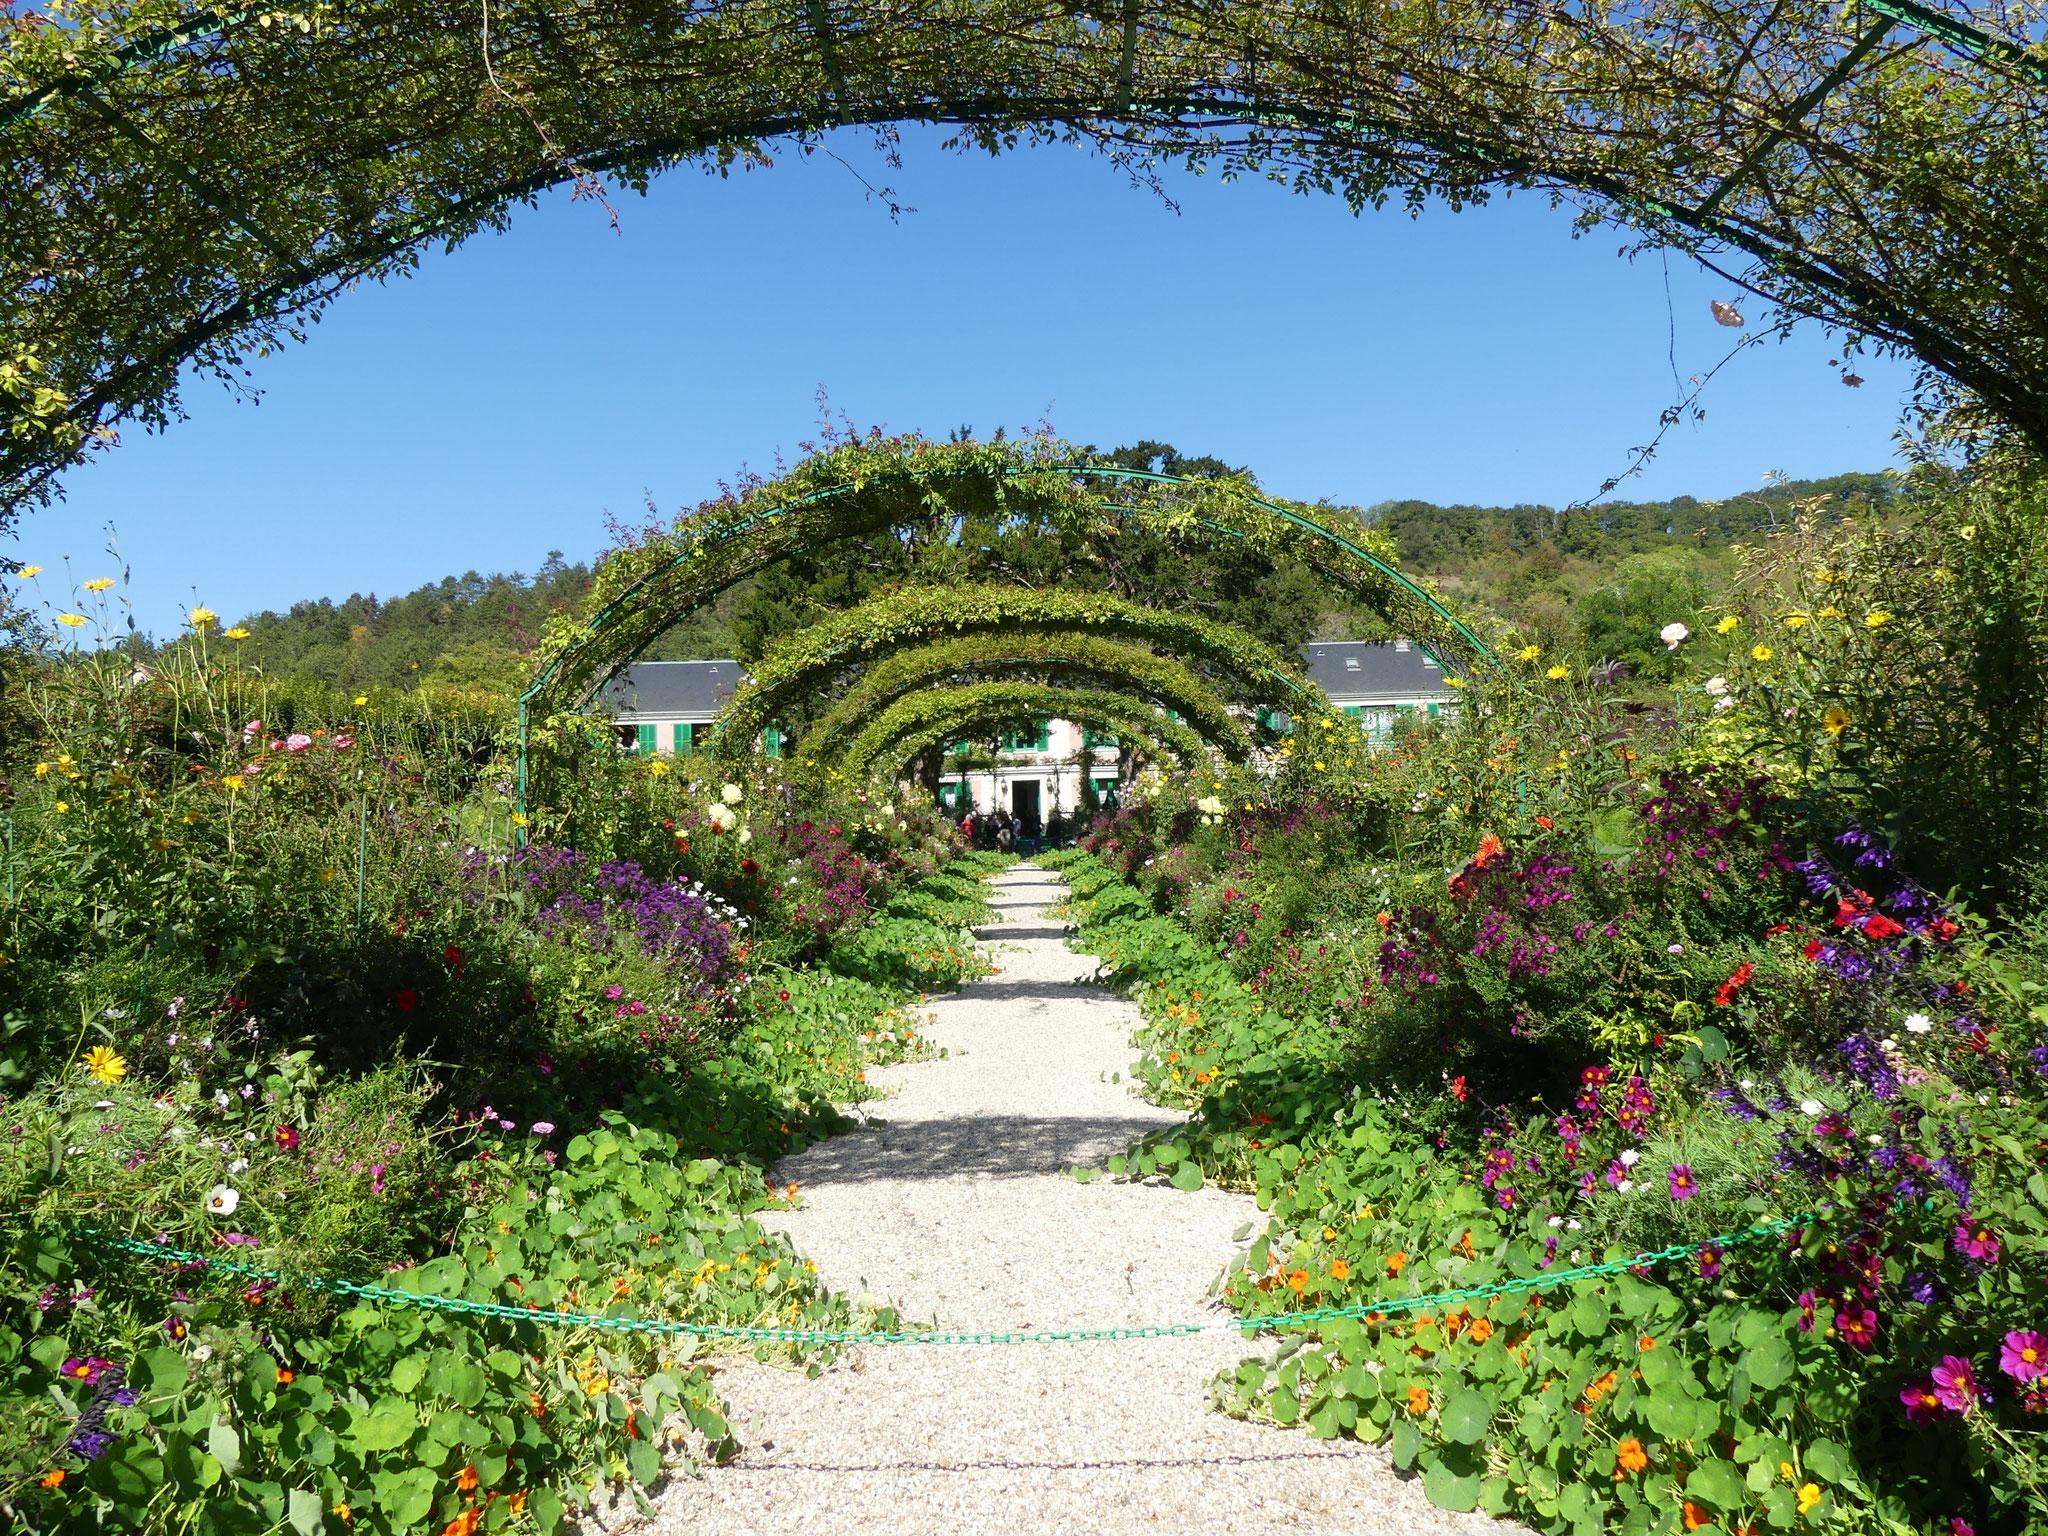 Allée Jardin Maison Monet